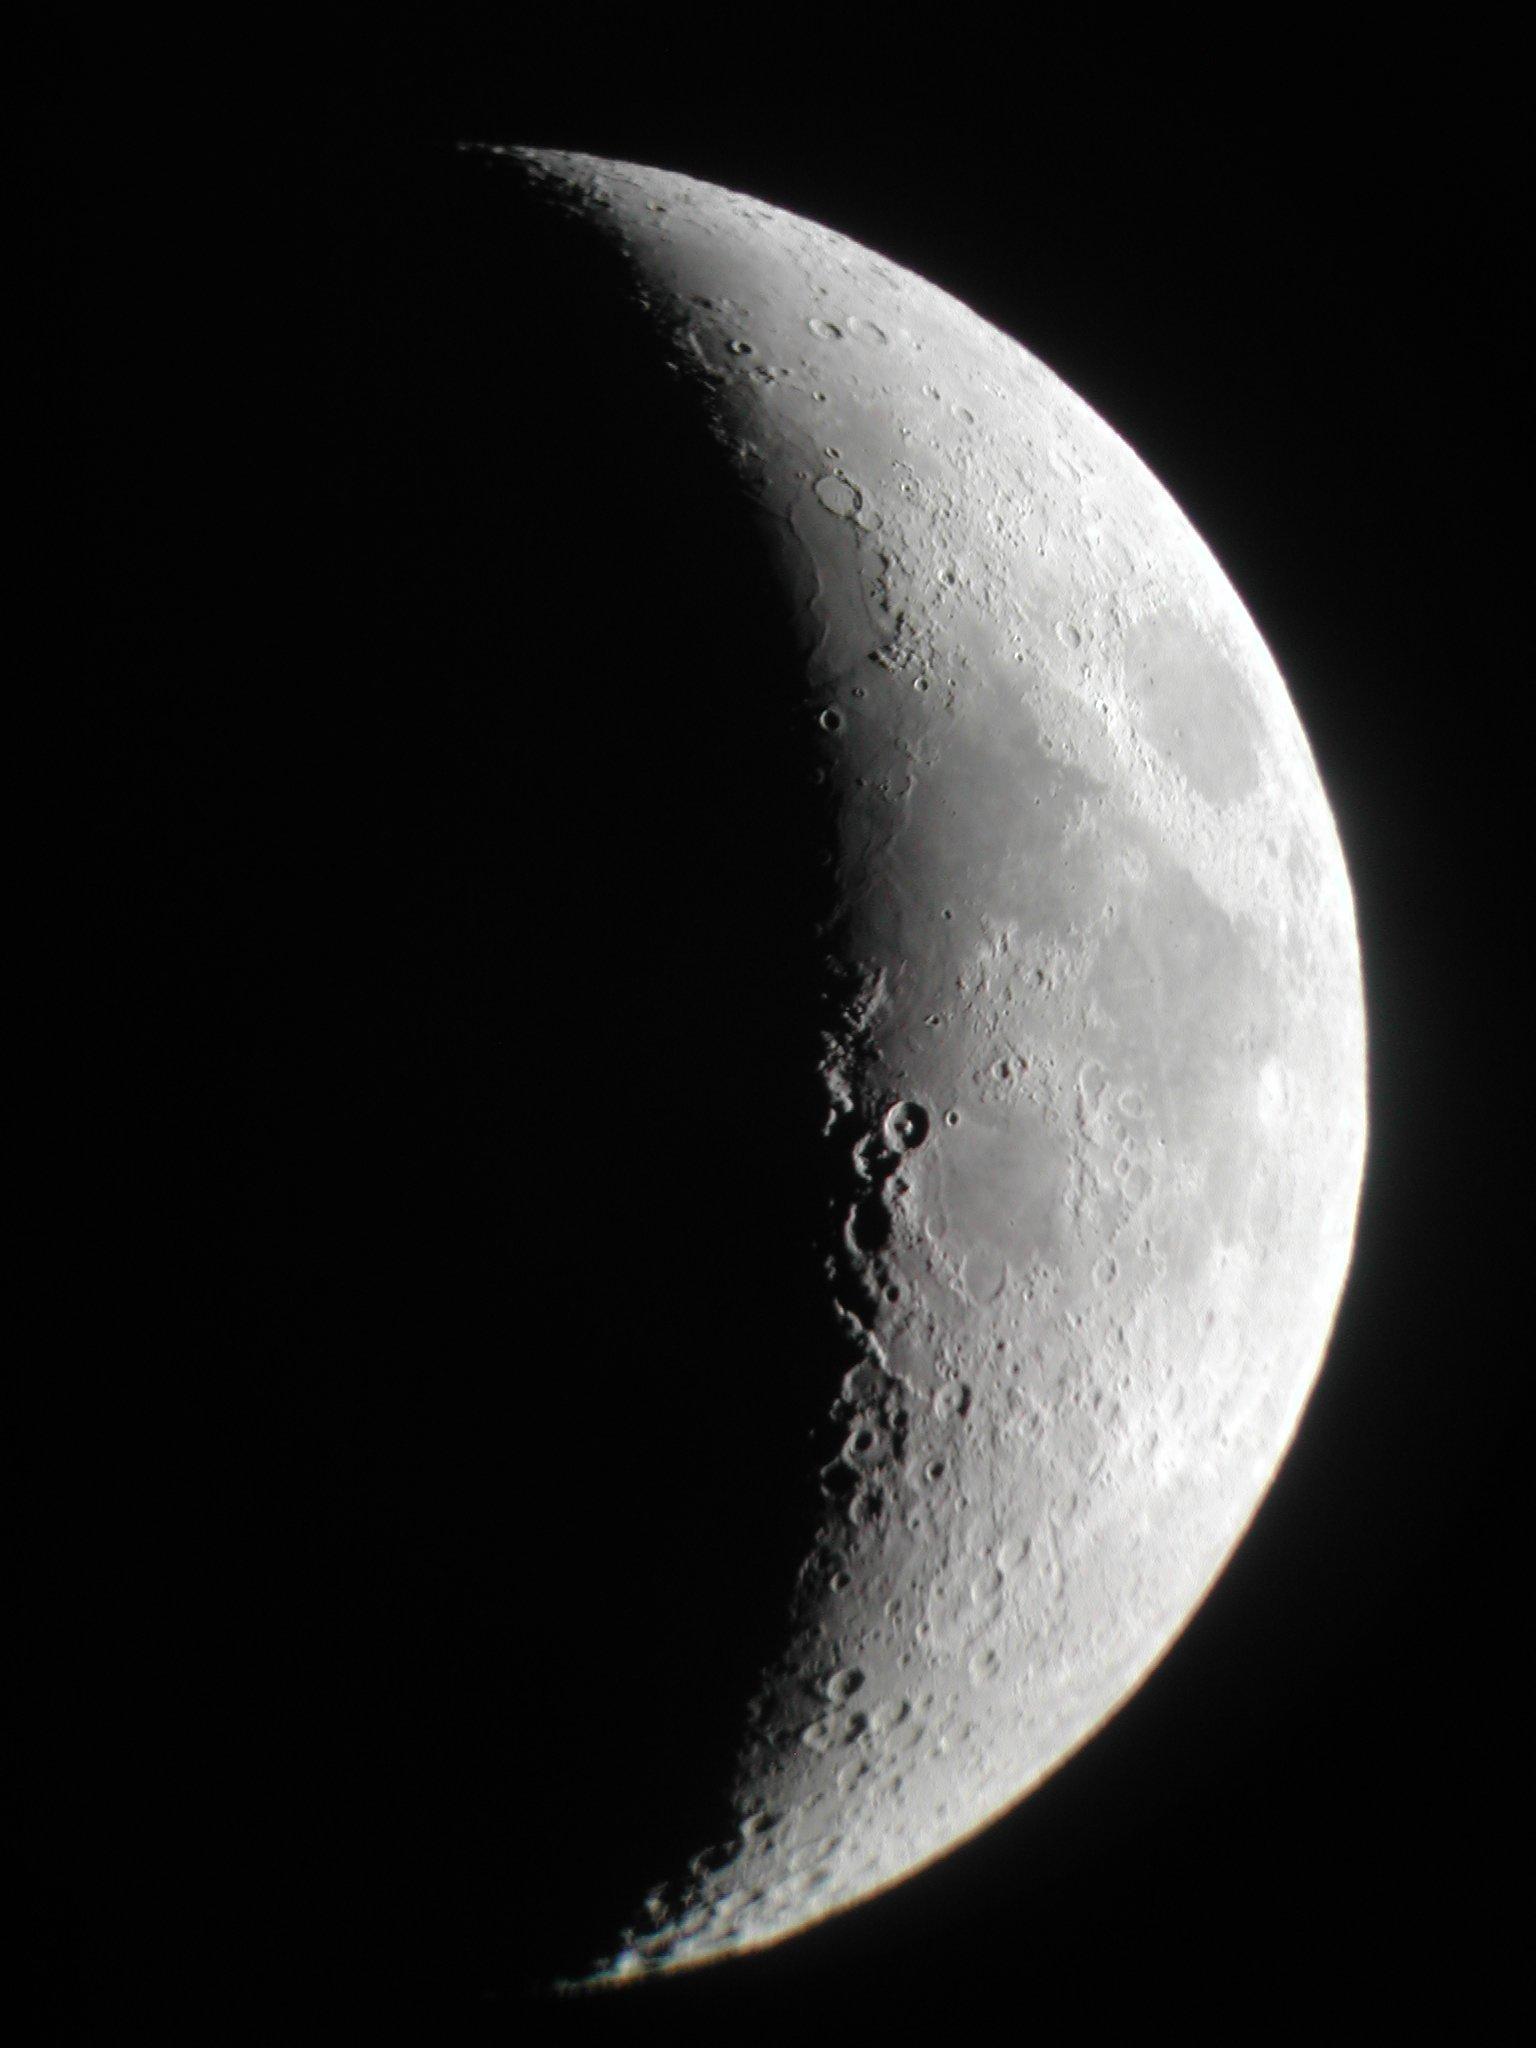 Lune de 5 jours image John French Michigan State University